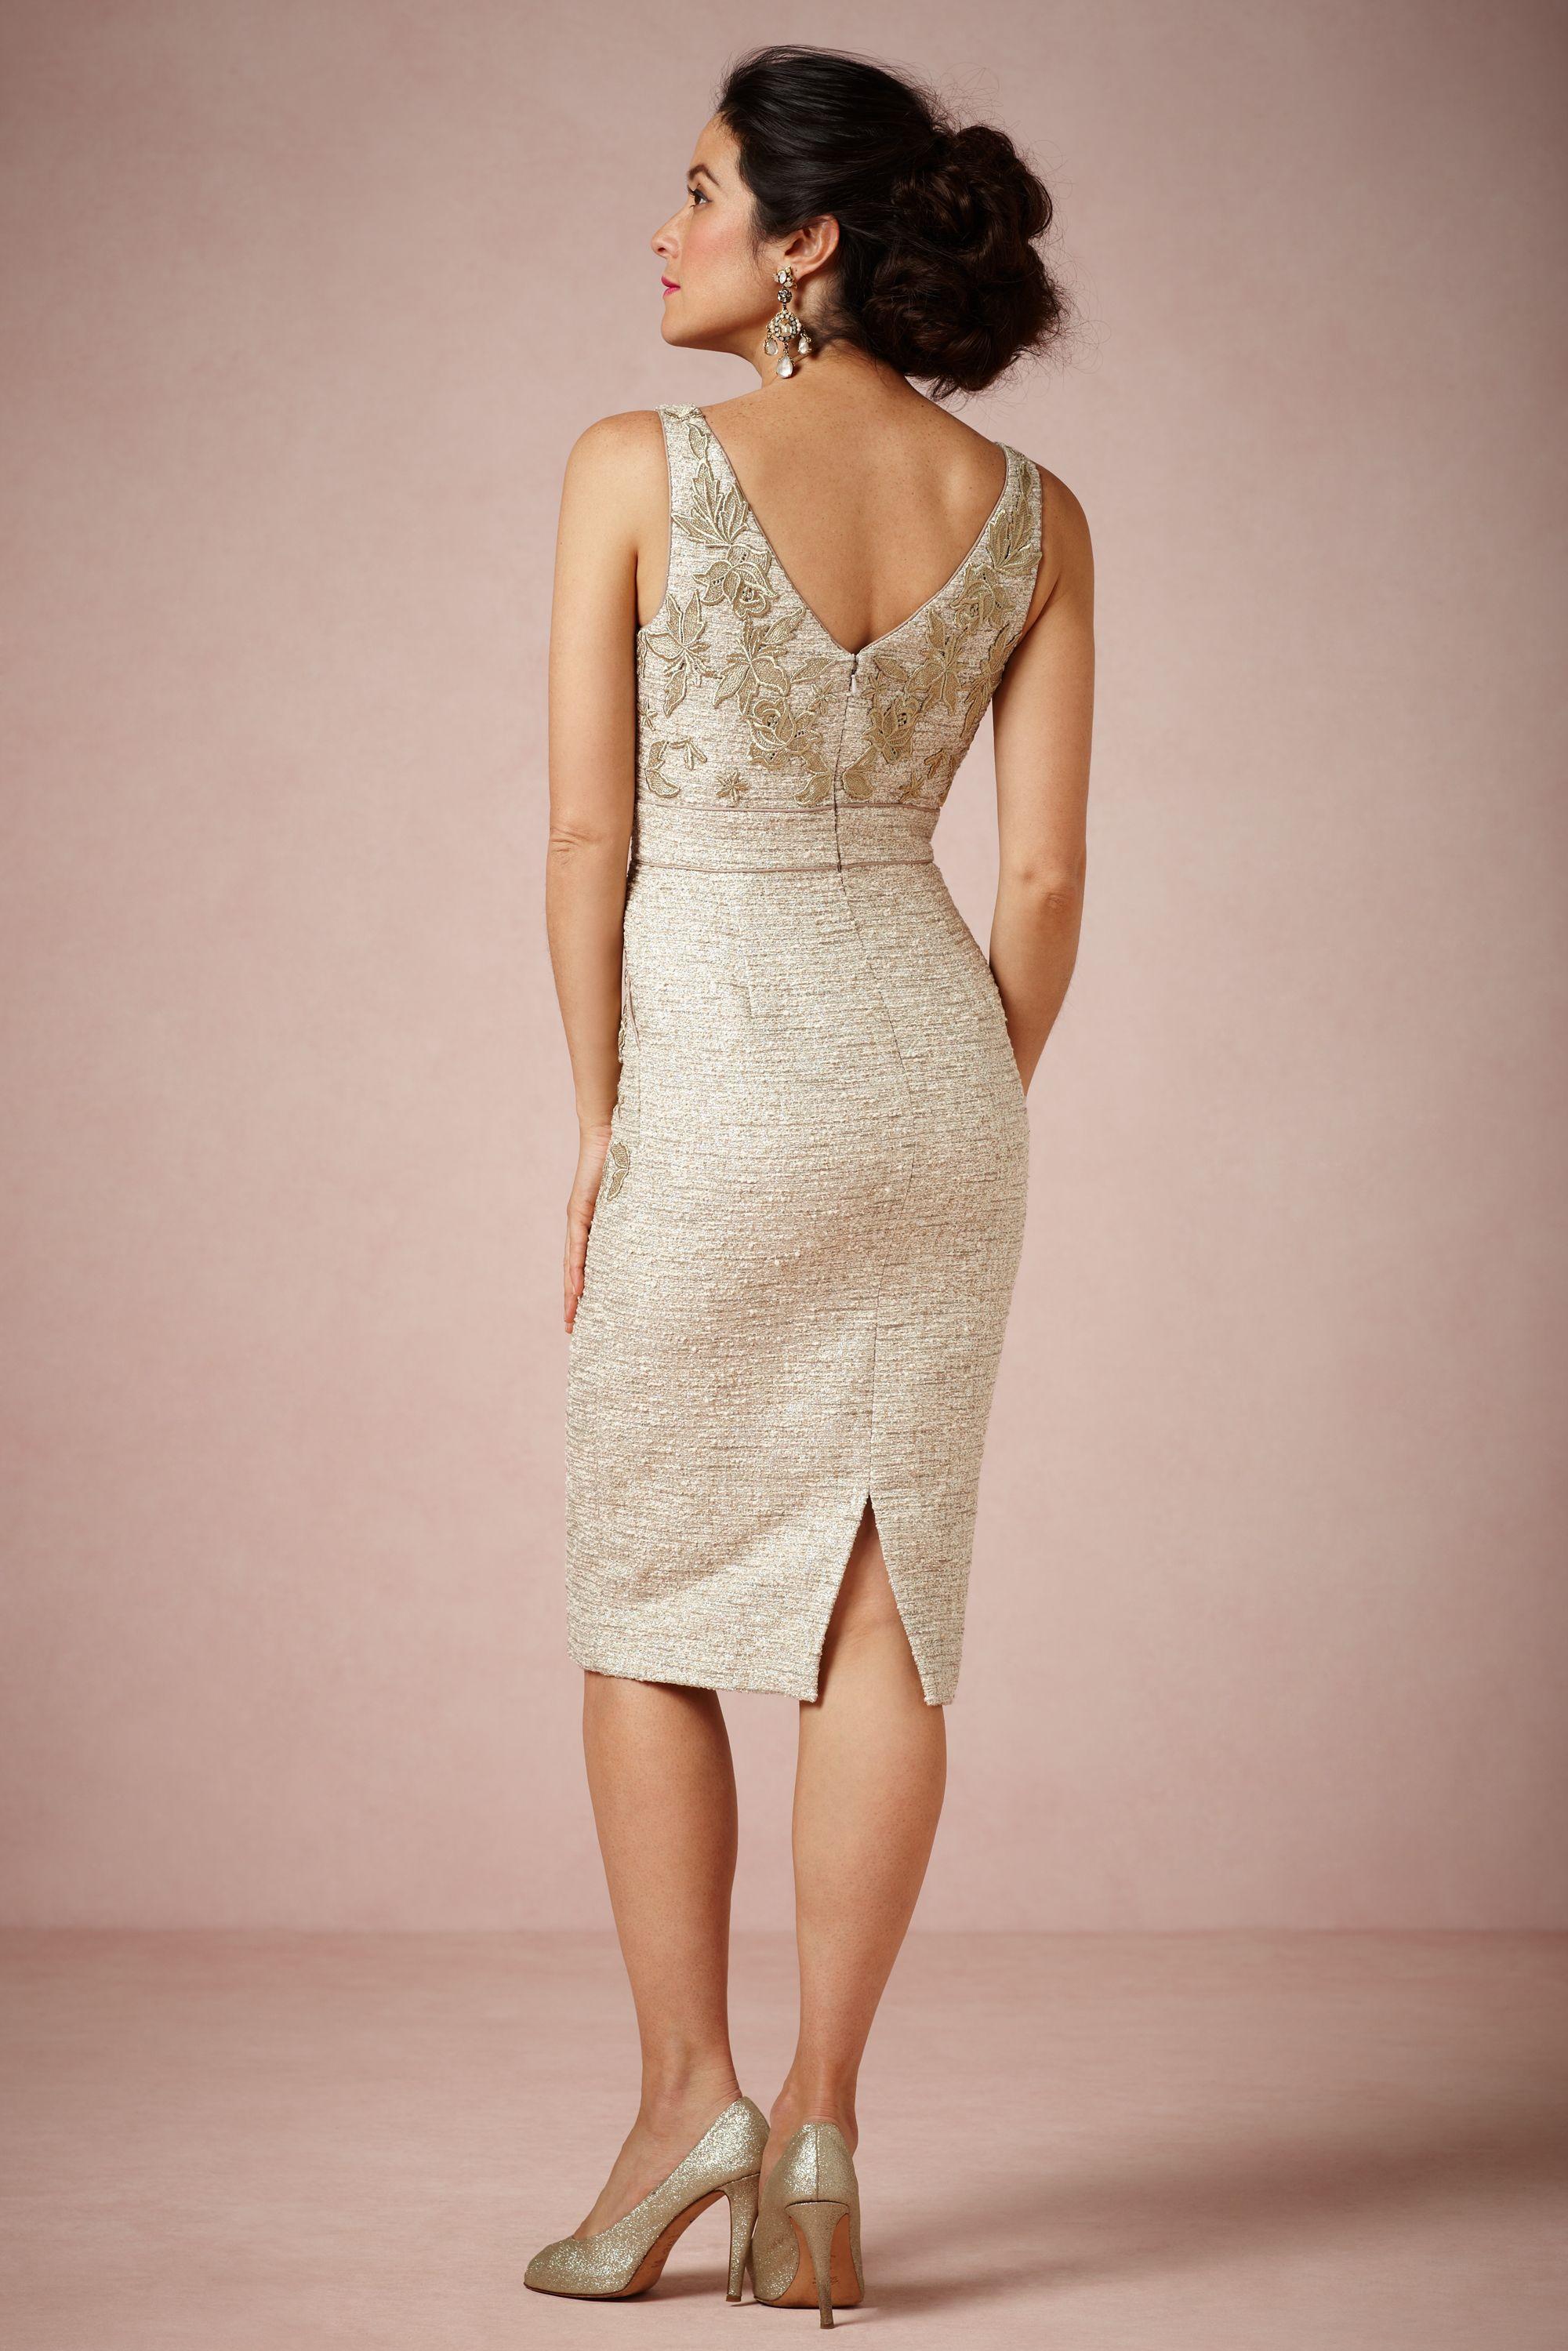 21 Vestidos Elegantes para la Madre de la Novia | Bride dresses ...